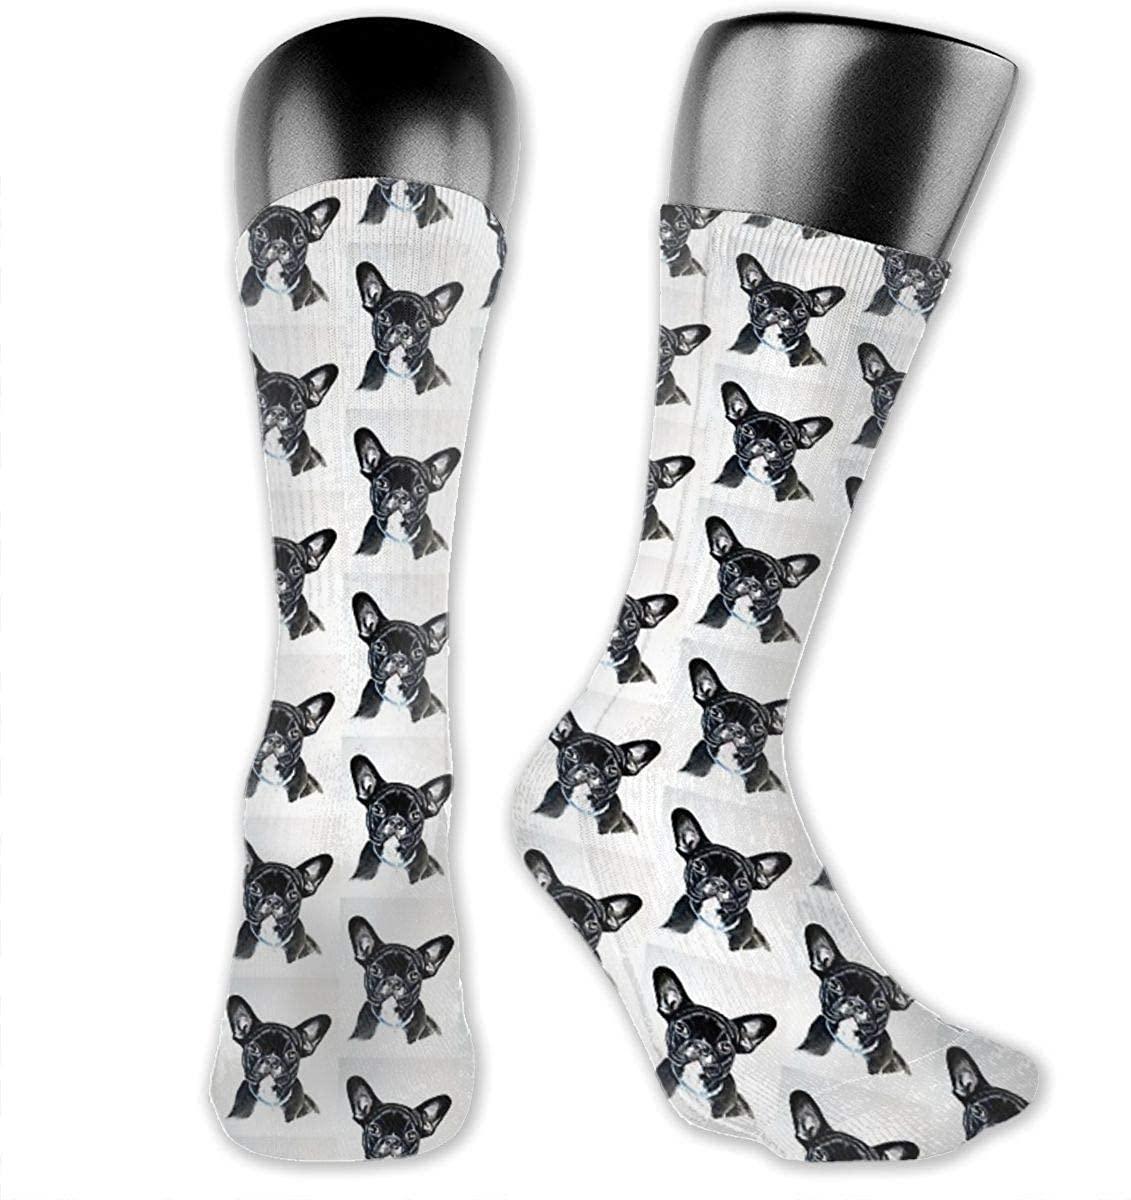 Unisex Crazy Funny Cool 3D Print French Bulldog Socks Colorful Athletic Travel Socks Novelty Casual Crew Socks